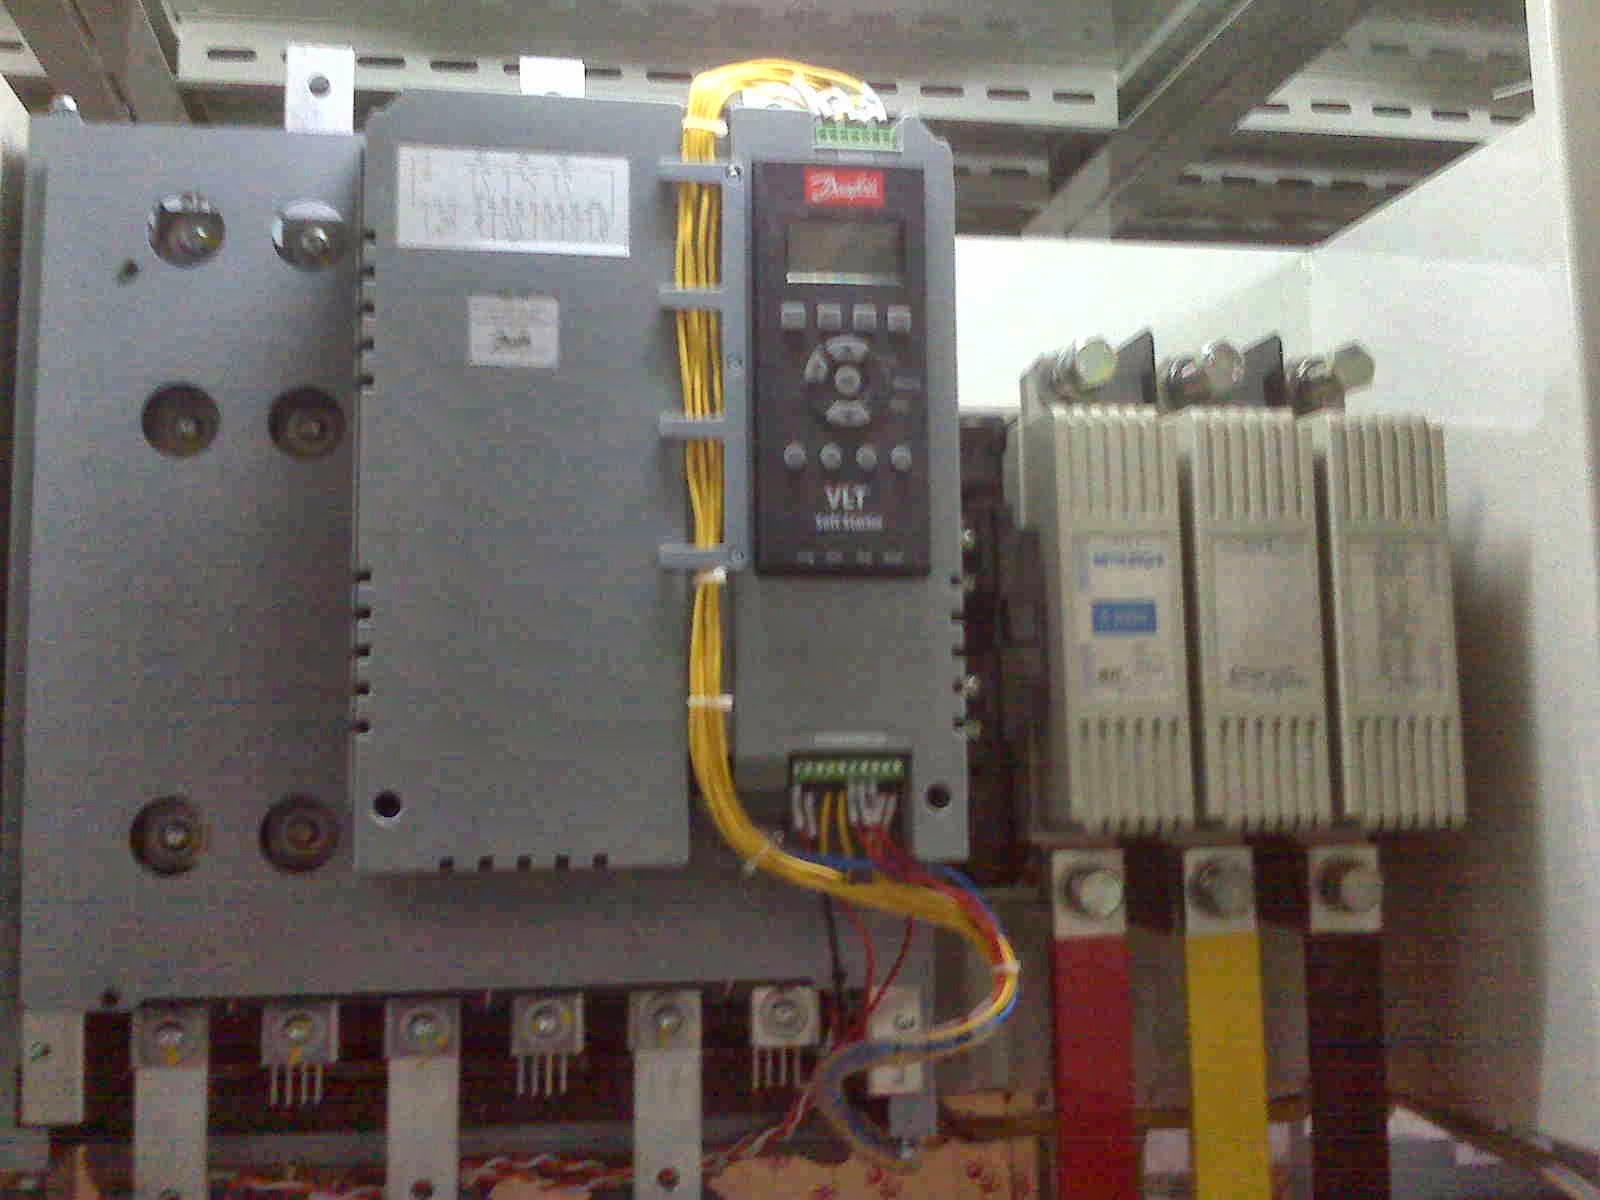 belajar assembling panel listrik type jenis panel listrik rh deniasep925 blogspot com Harga Panel Listrik K3 Listrik Sign